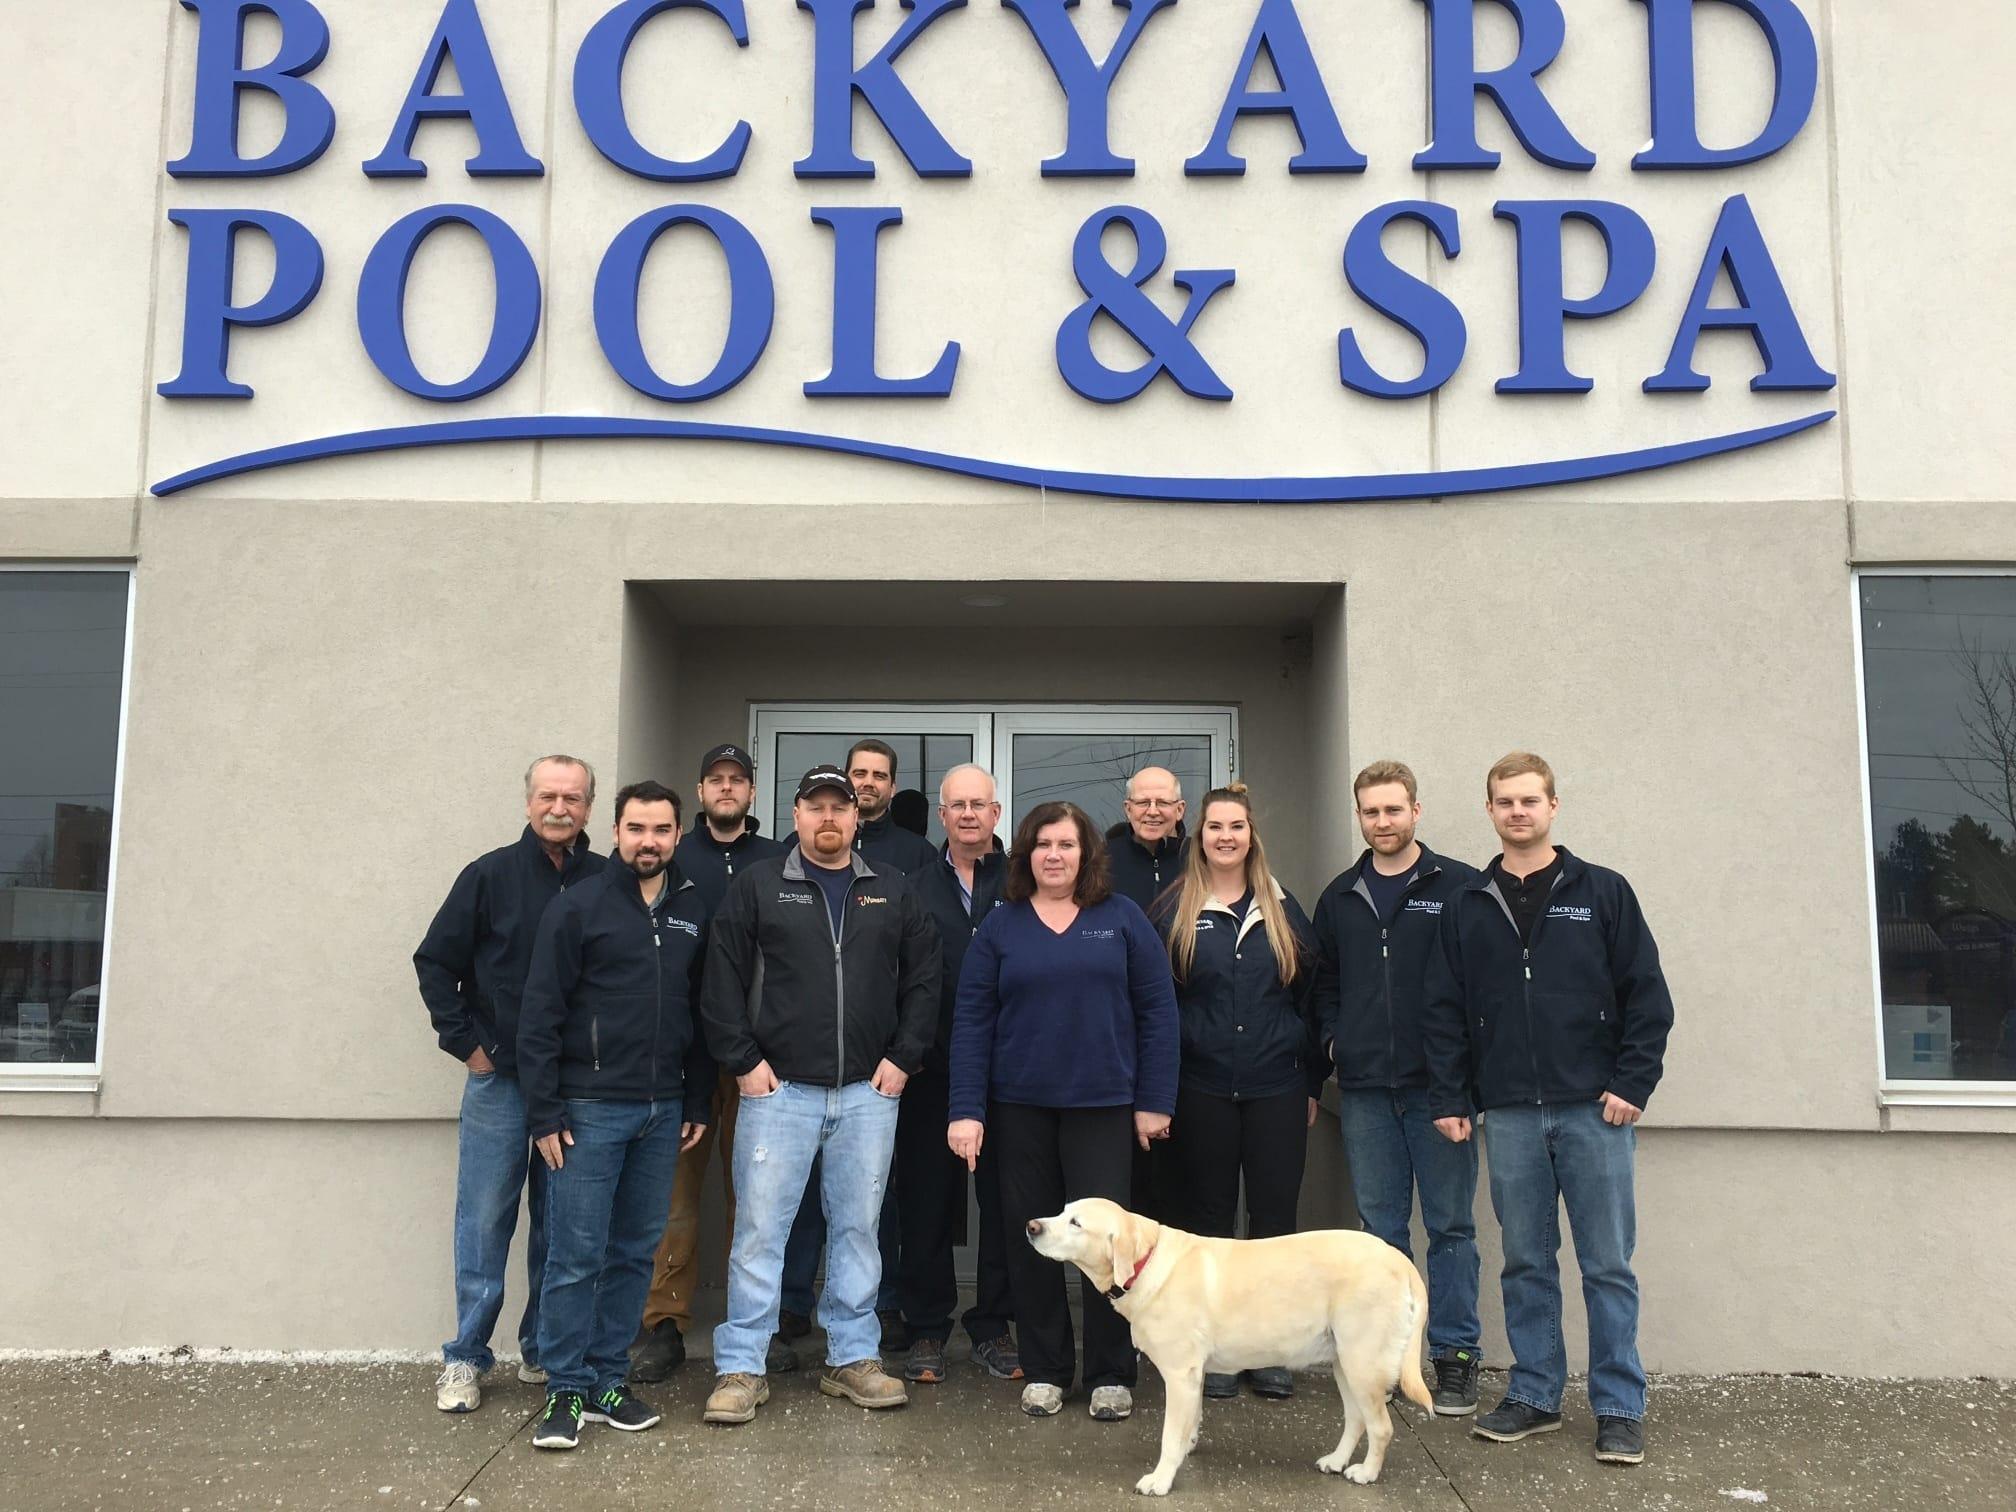 Backyard Pool & Spa team photo